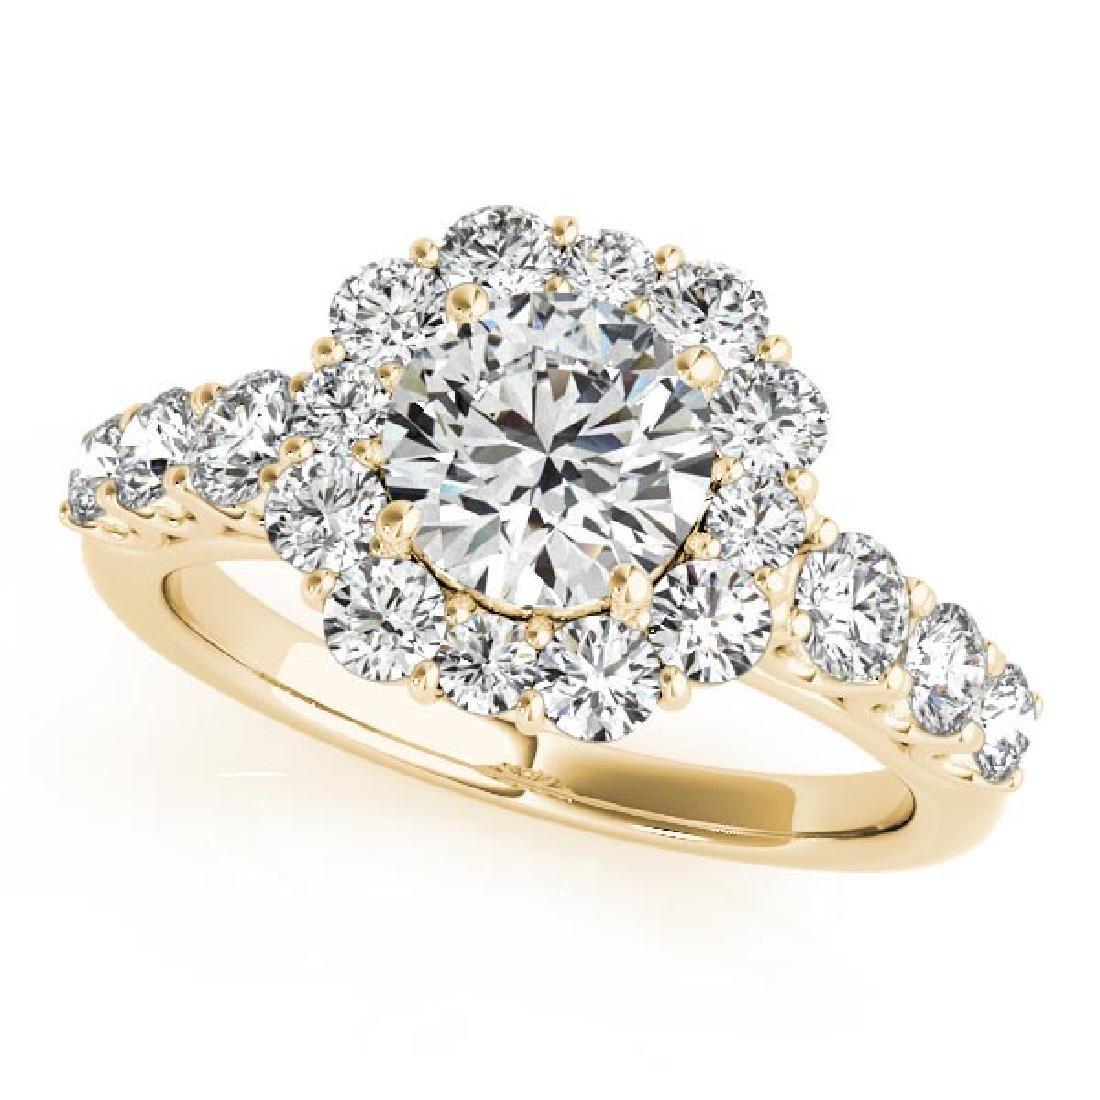 CERTIFIED 18K YELLOW GOLD 2.08 CT G-H/VS-SI1 DIAMOND HA